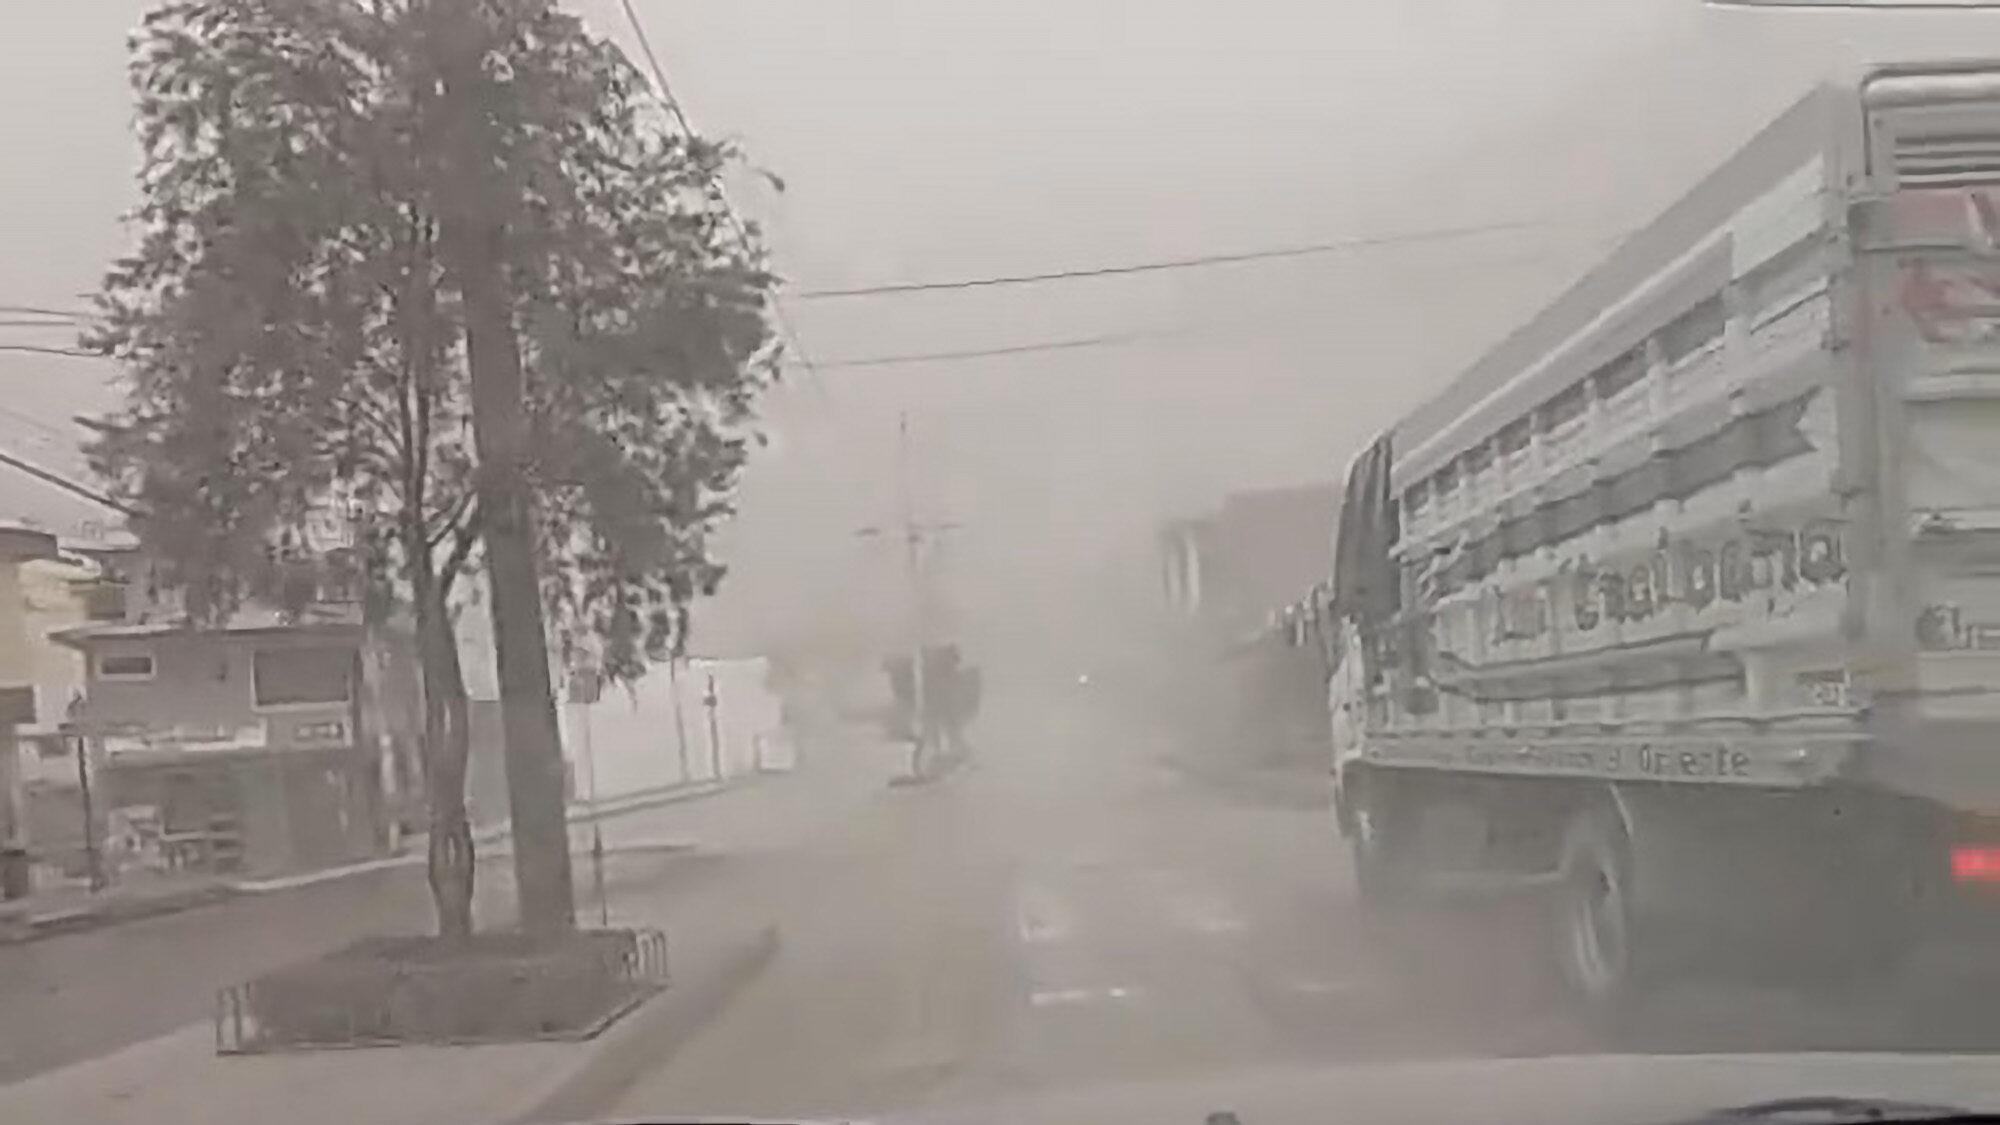 VIDEO: Ash Falls In Ecuador After Volcano Eruption